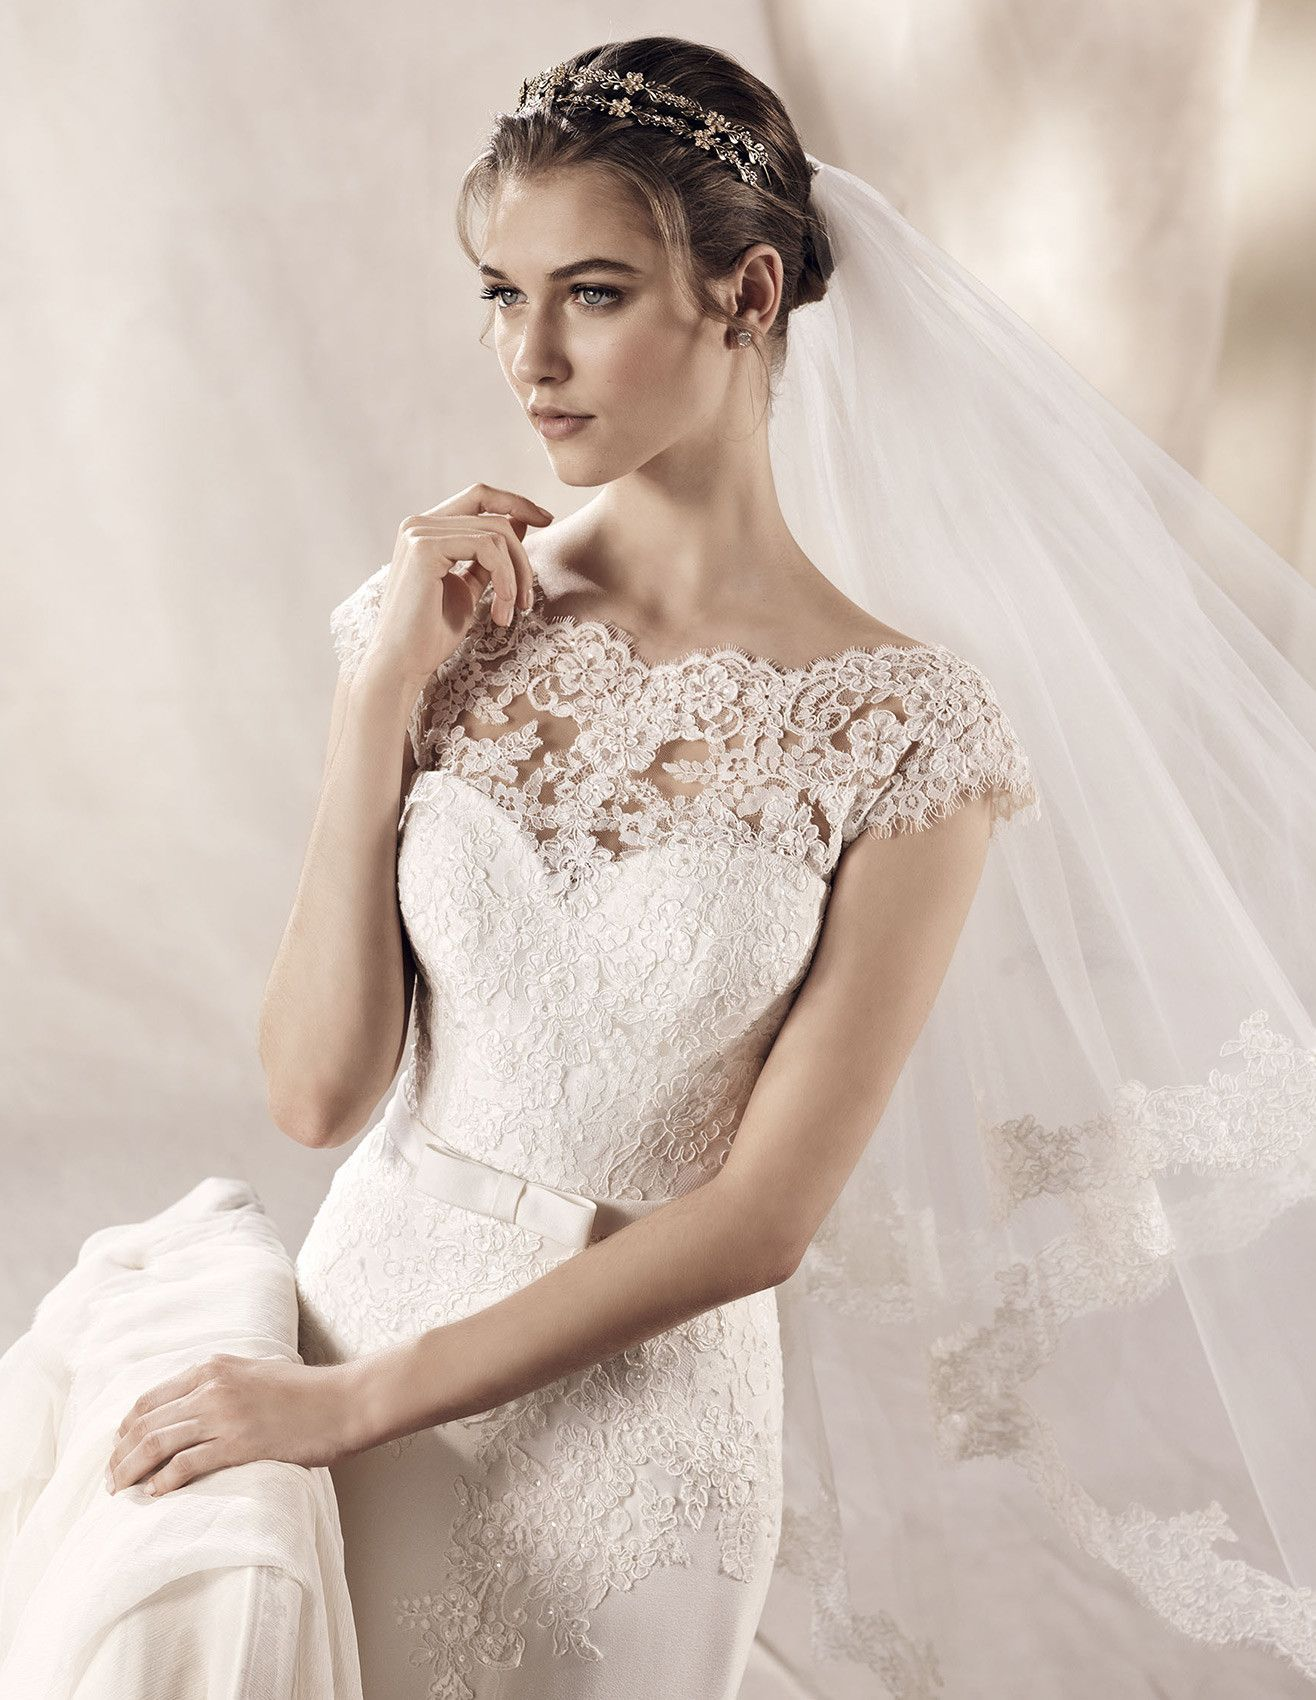 brautkleid yuriana | Wedding | Pinterest | Brautkleid